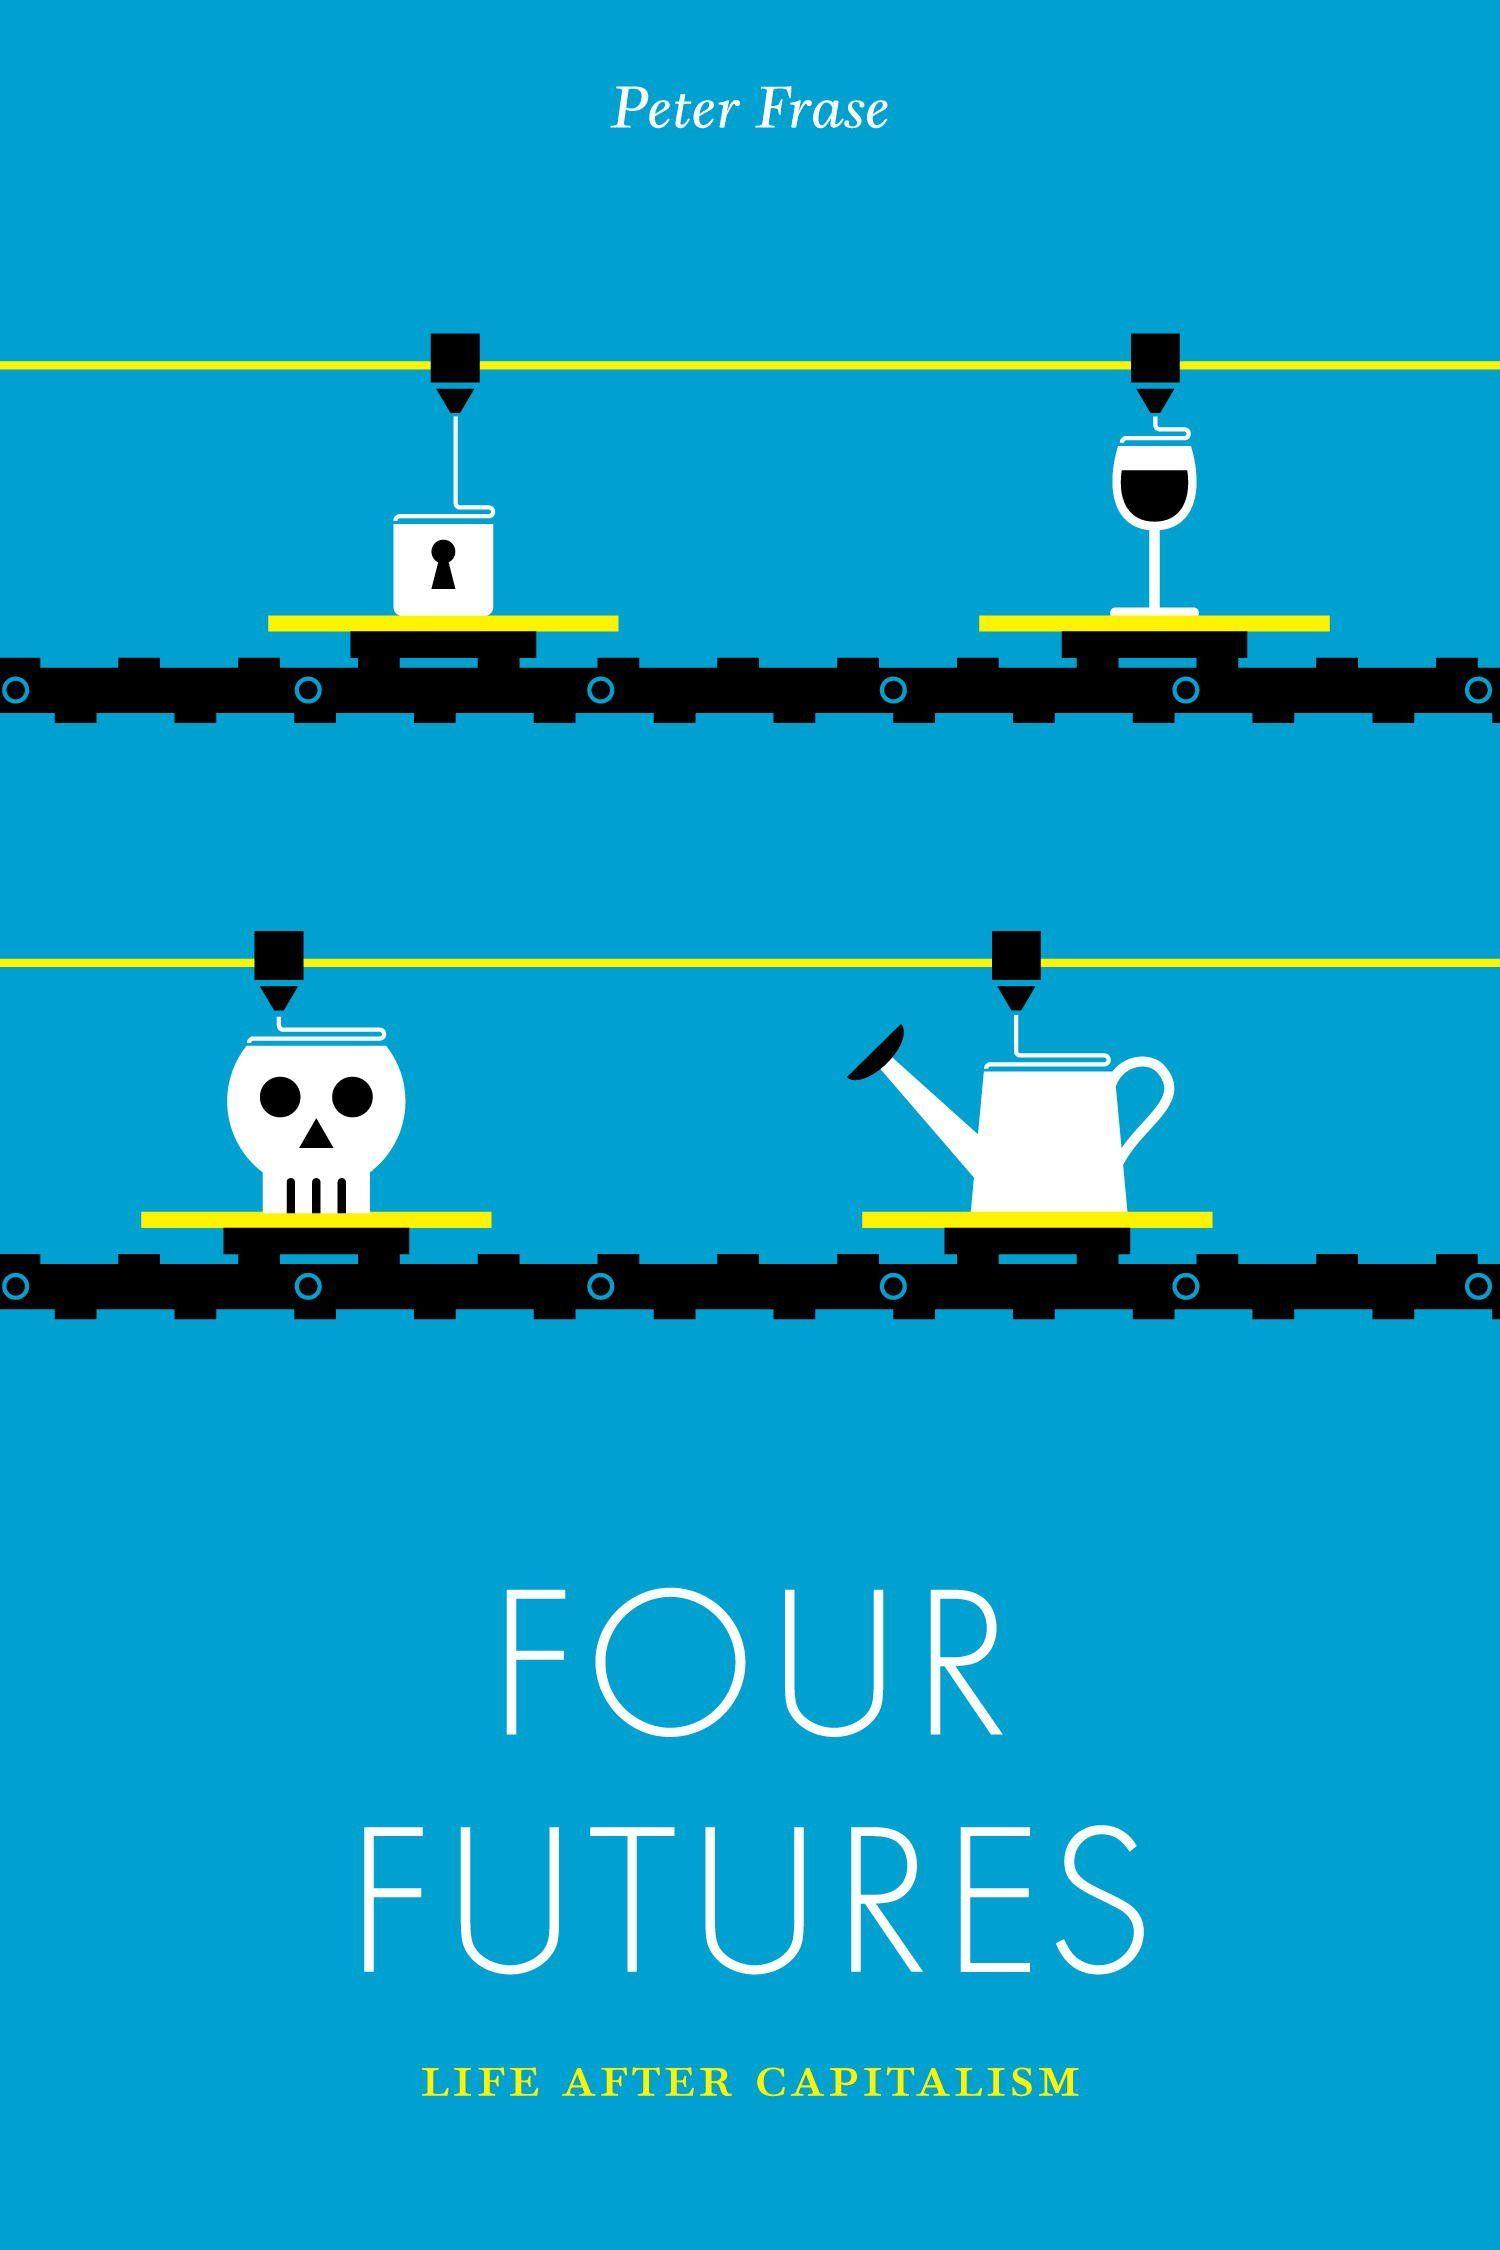 Four futures life after capitalism jacobin peter frase